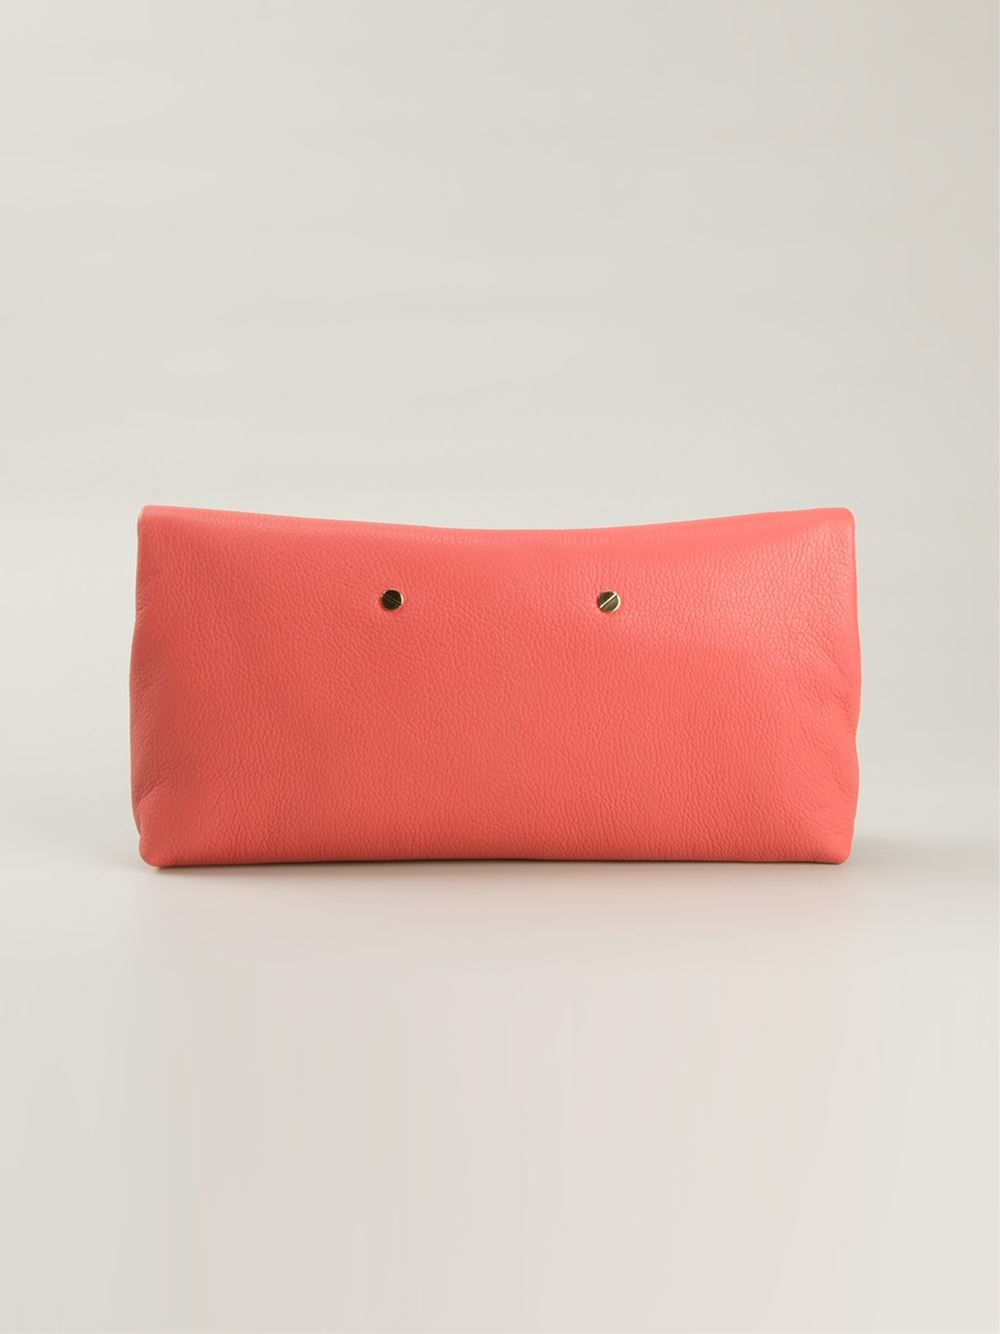 Chlo�� \u0026#39;drew\u0026#39; Clutch in Pink (yellow \u0026amp; orange) | Lyst